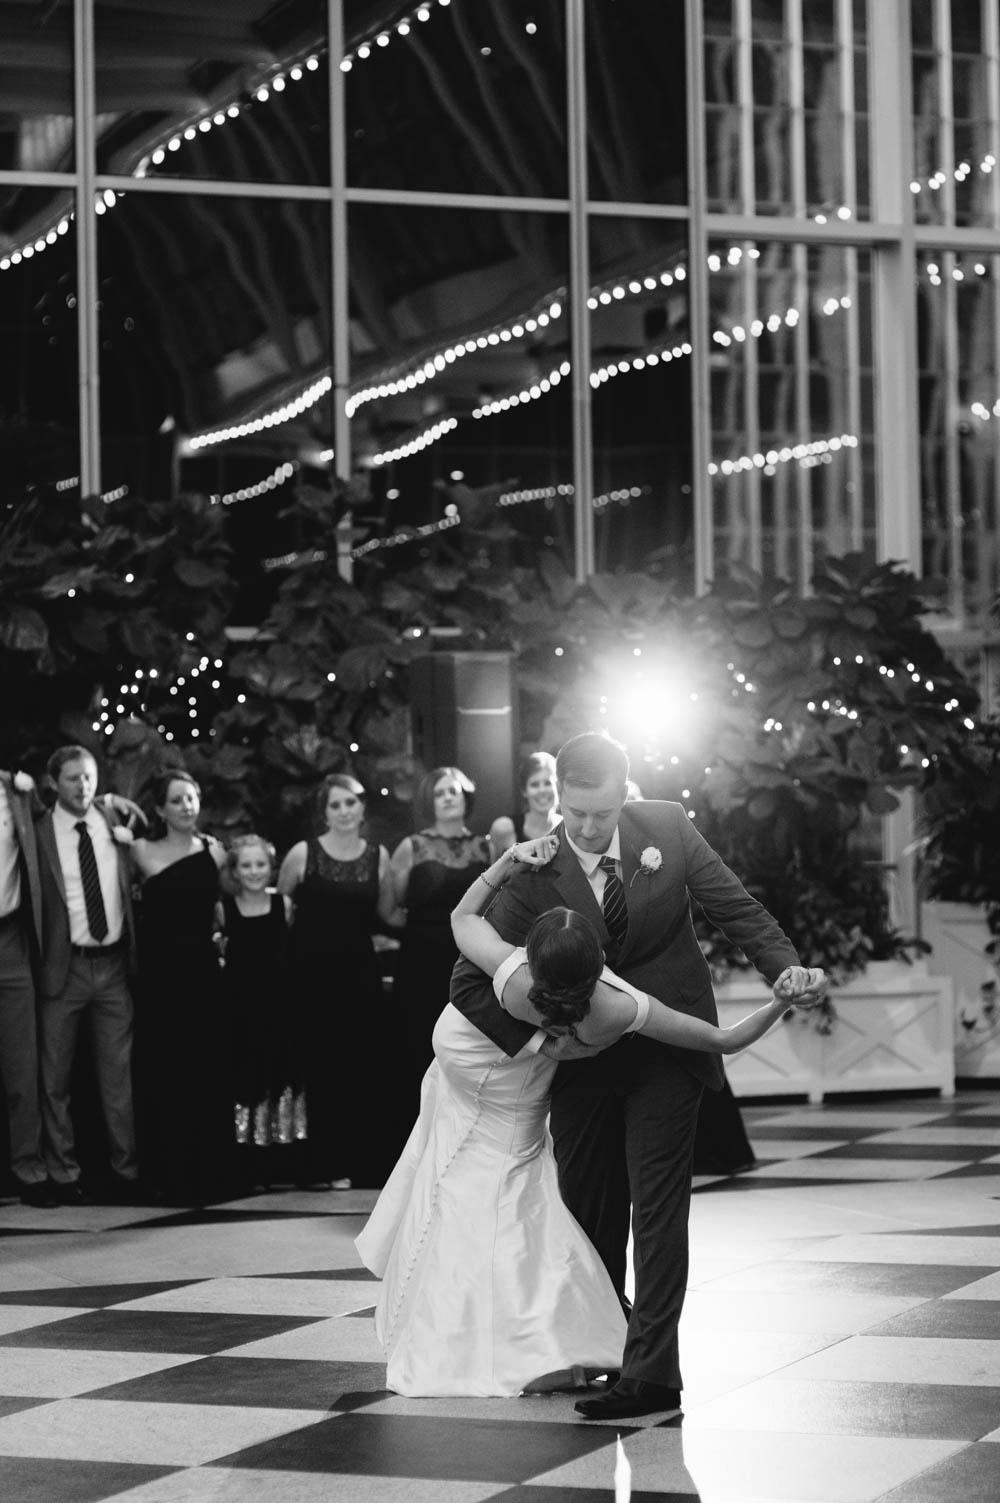 wintergarden-wedding-pittsburgh-122.jpg